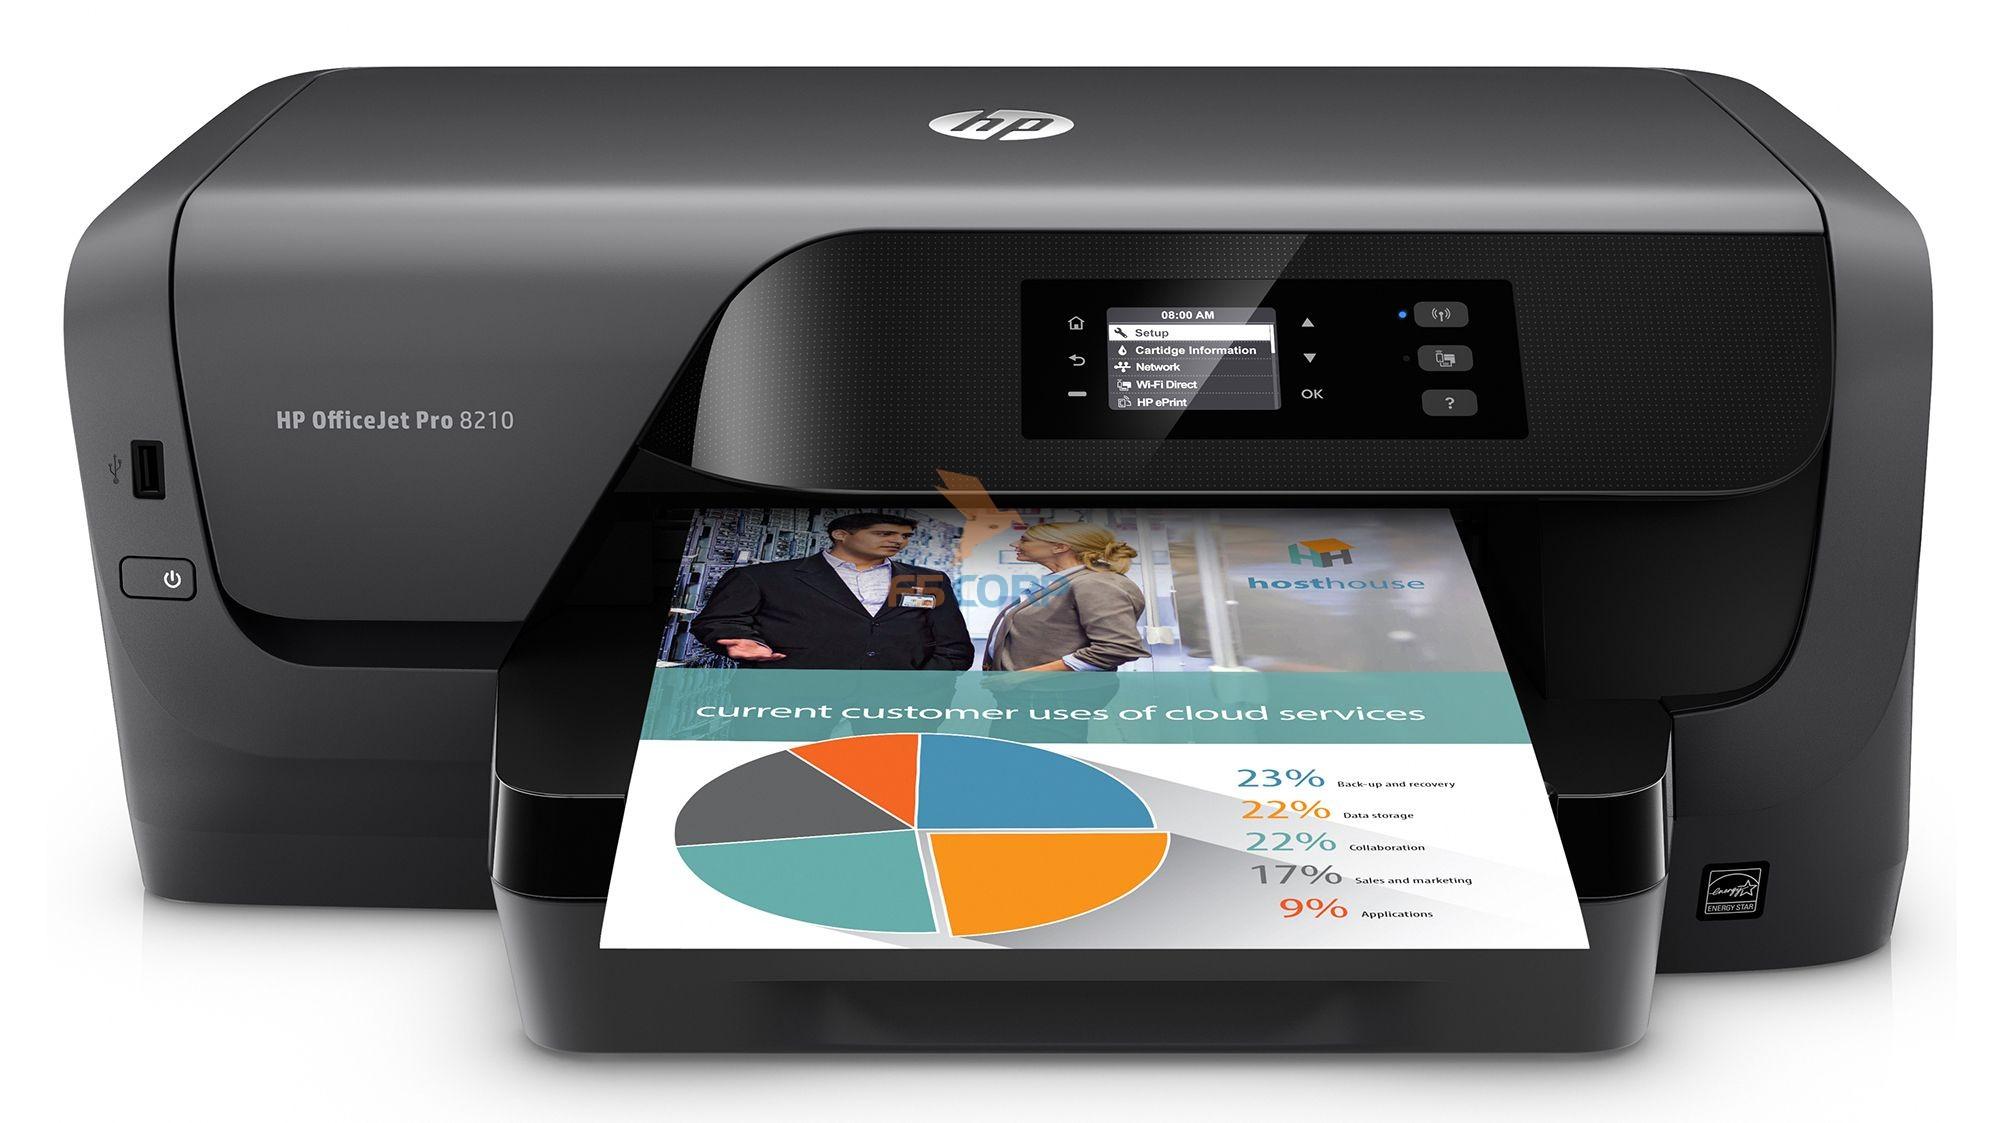 Máy in phun màu HP Officejet Pro 8210